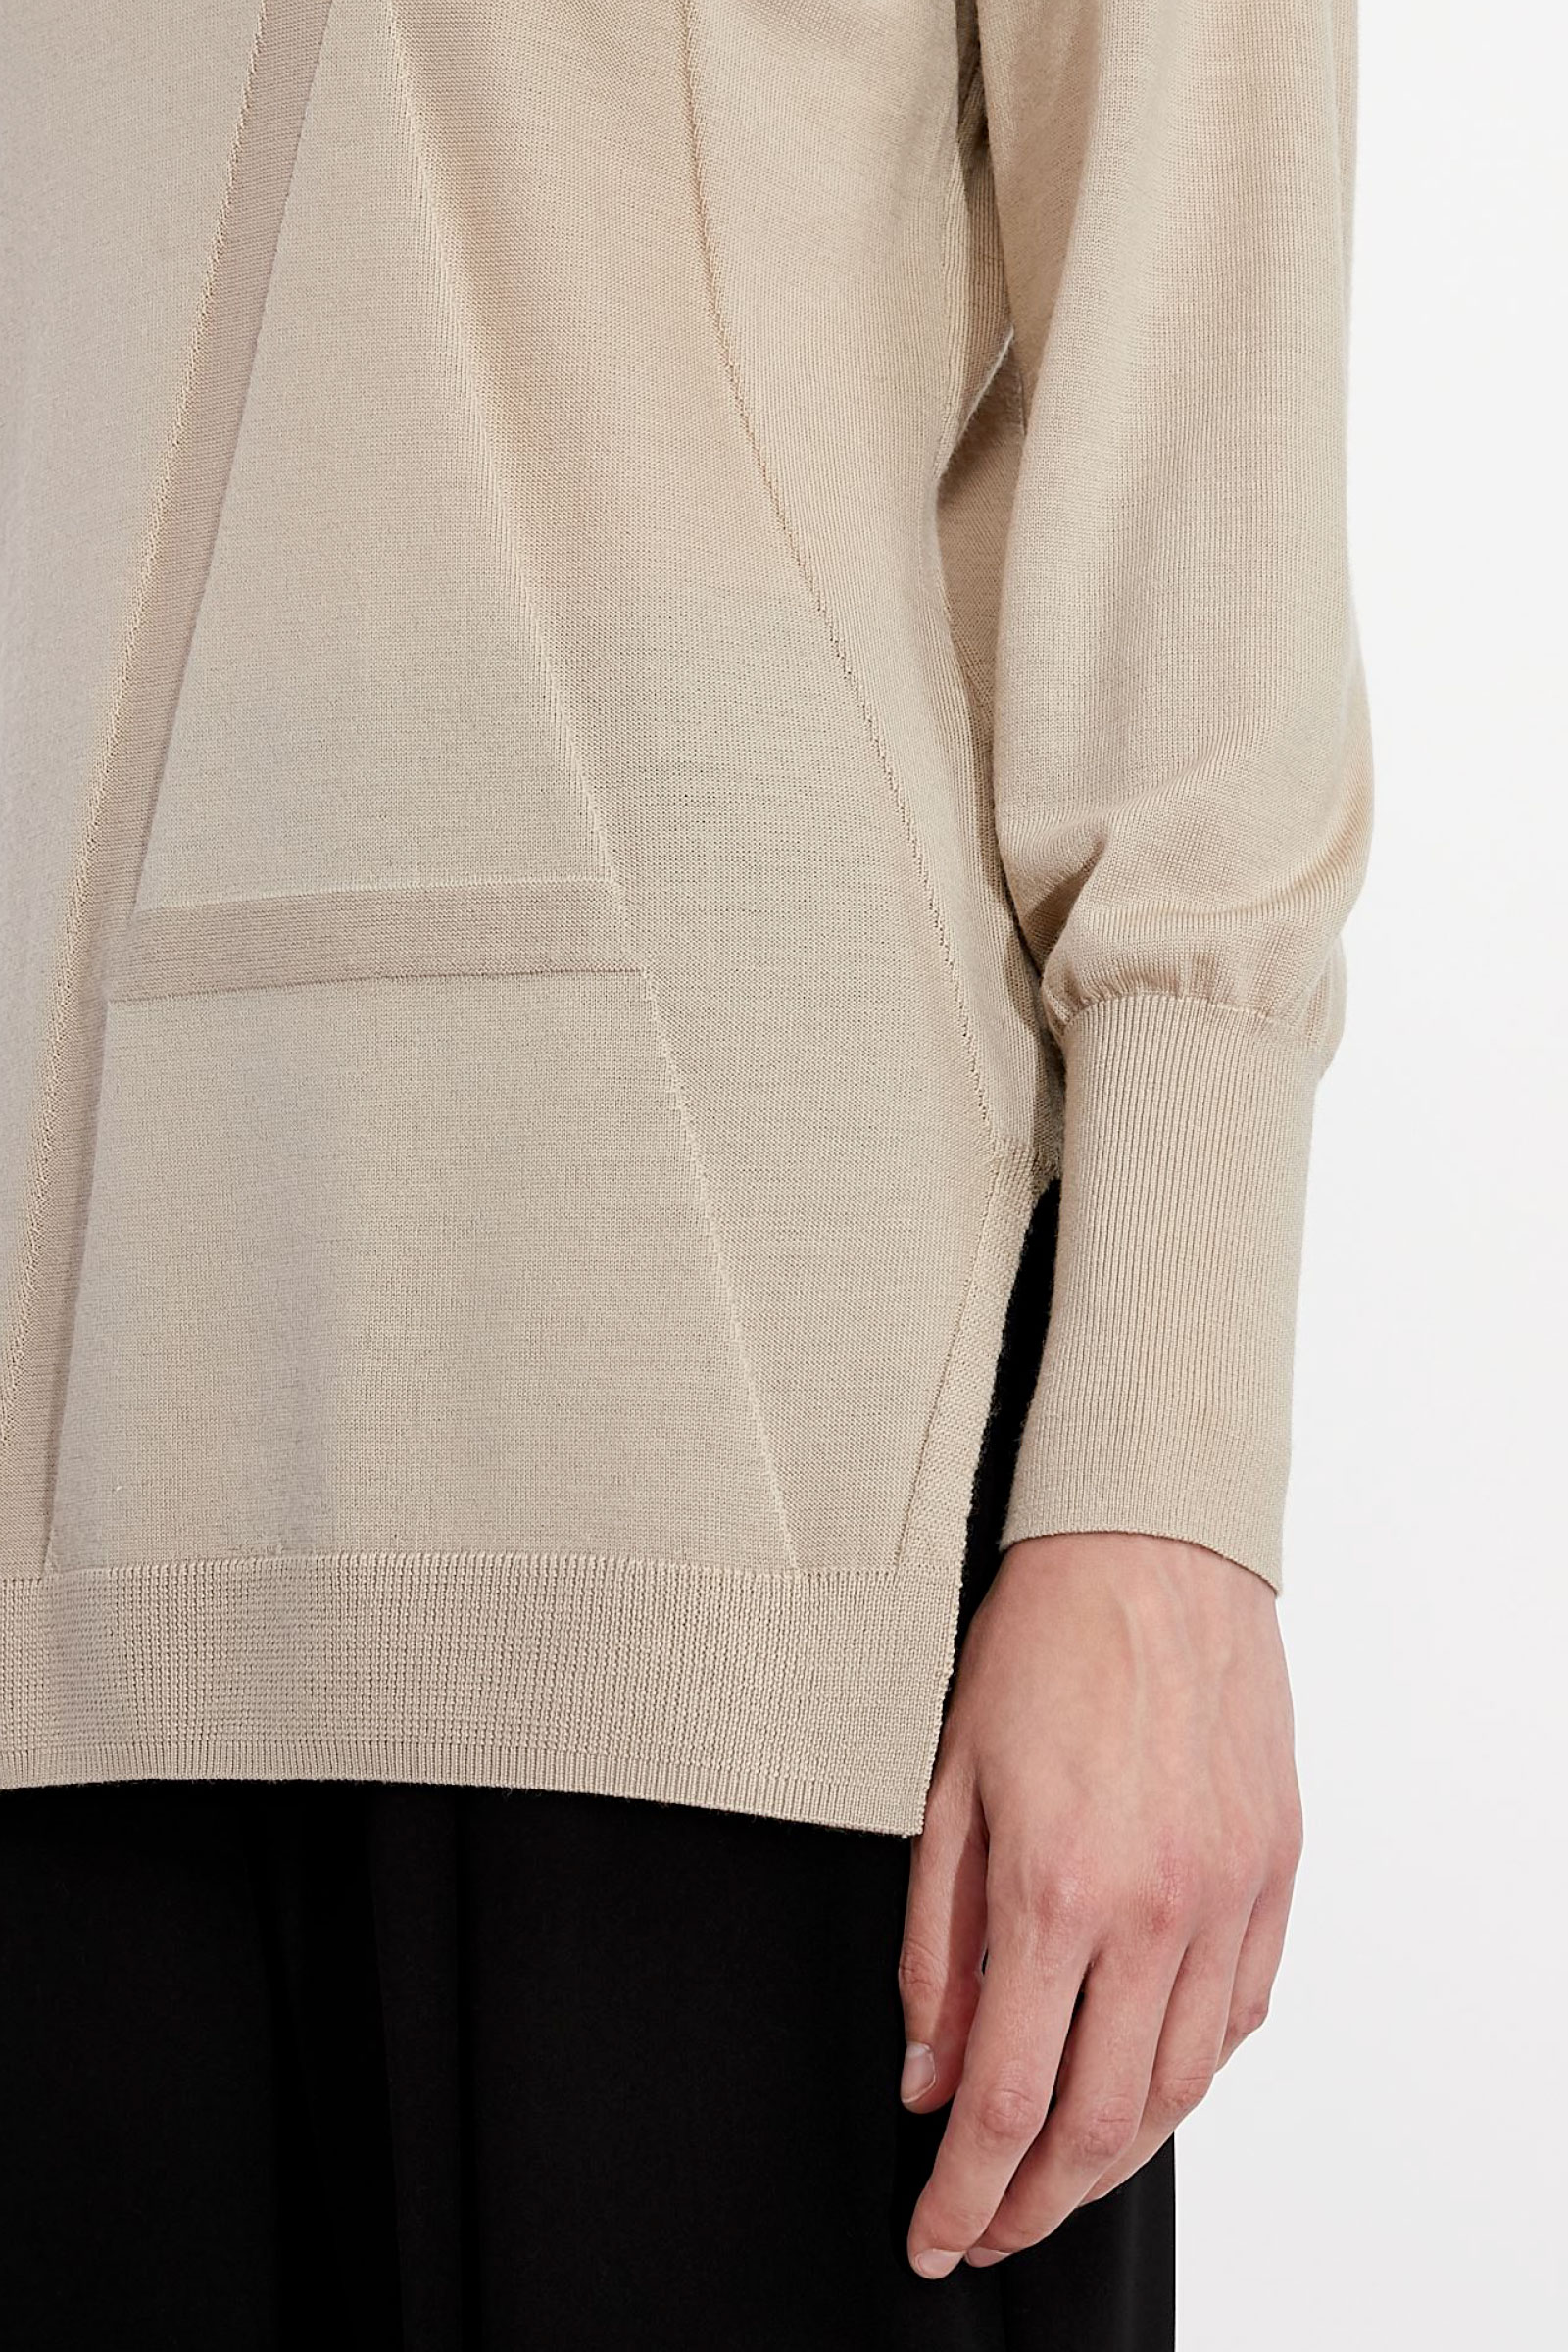 Pullover Donna ARMANI EXCHANGE | Pullover | 8NYM4M YMH4Z1724